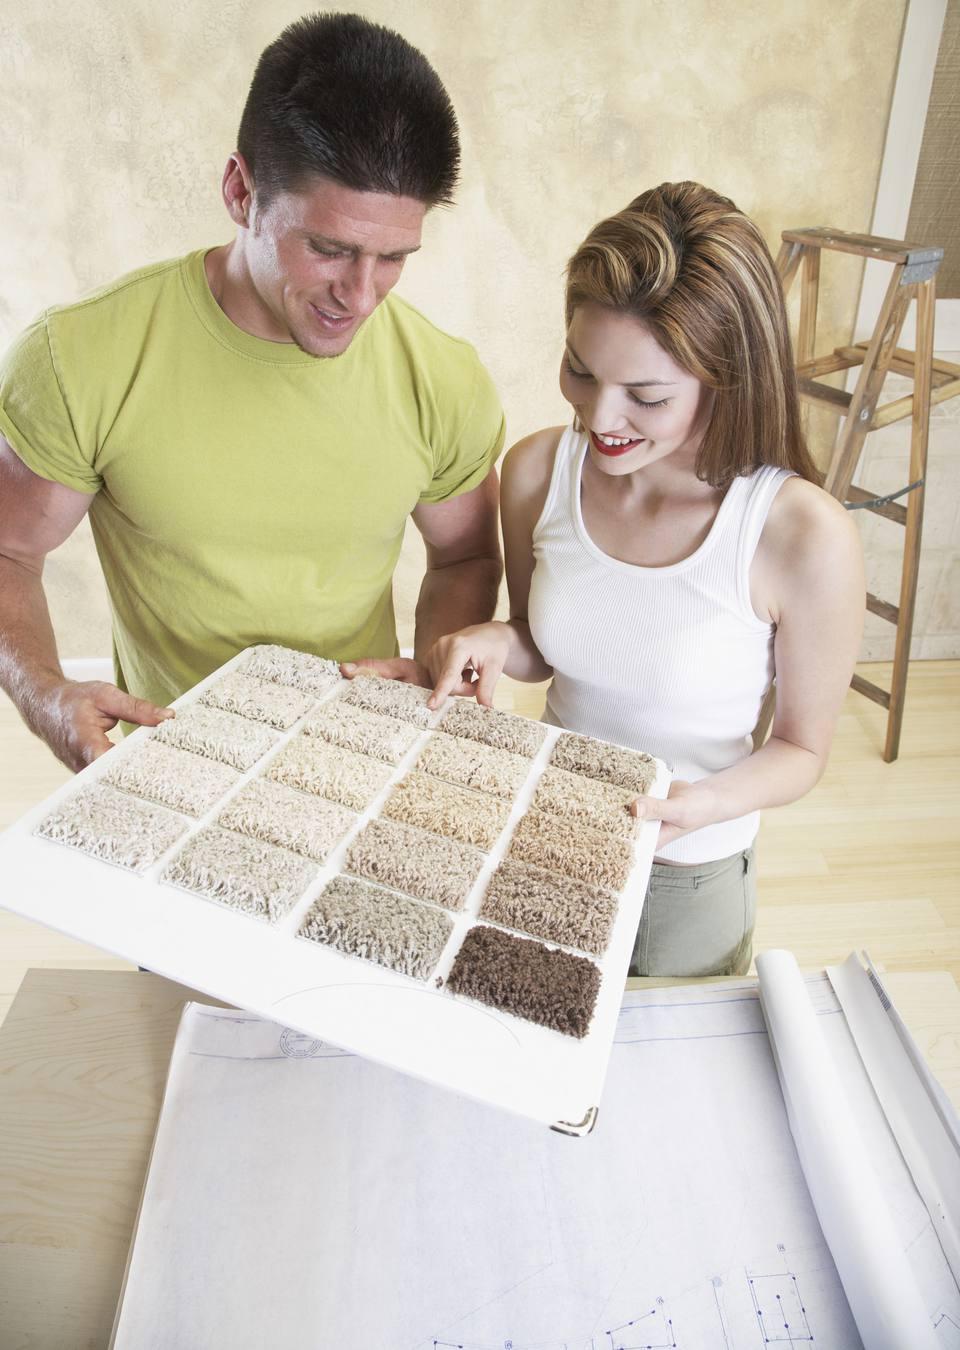 Couple choosing carpet sample with blueprints